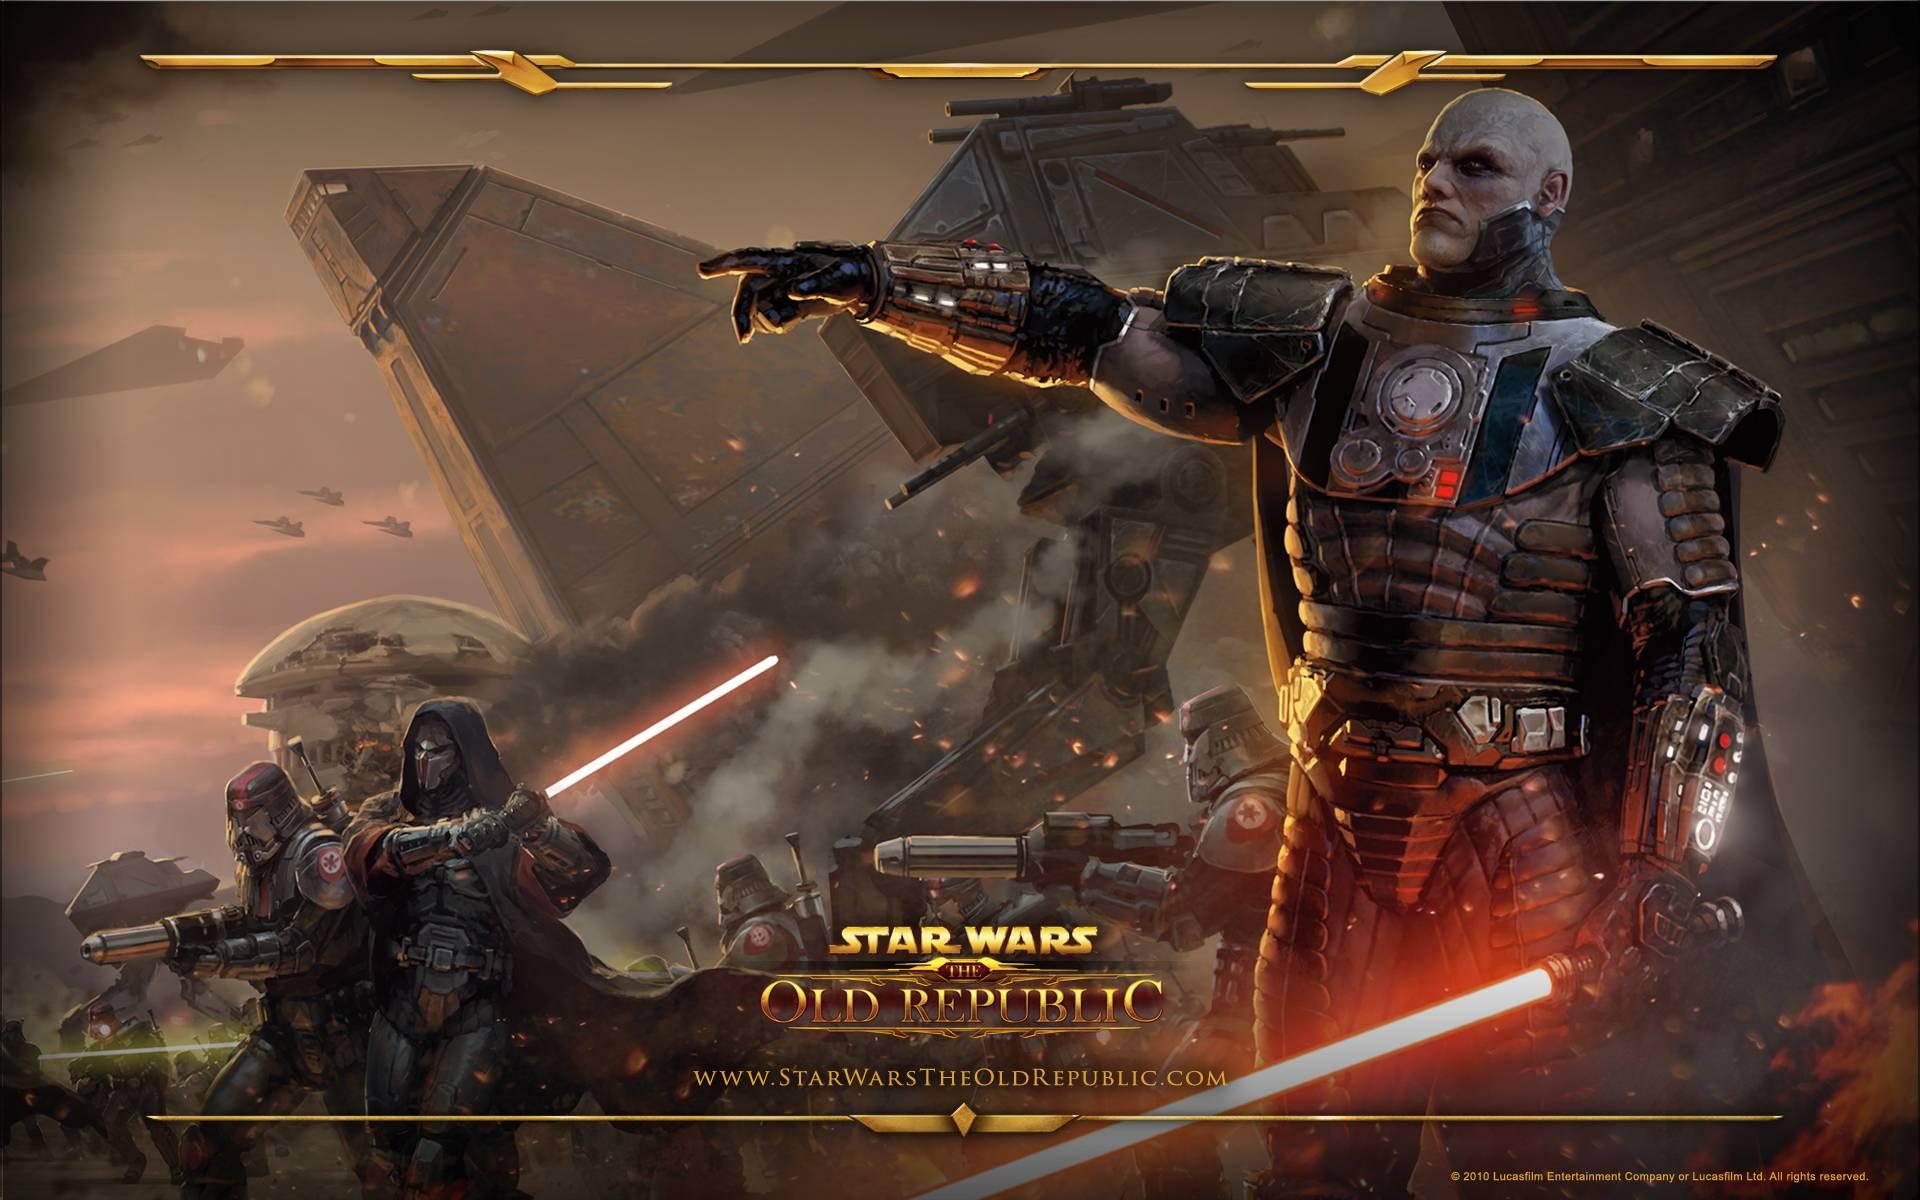 Star Wars Old Republic Wallpaper